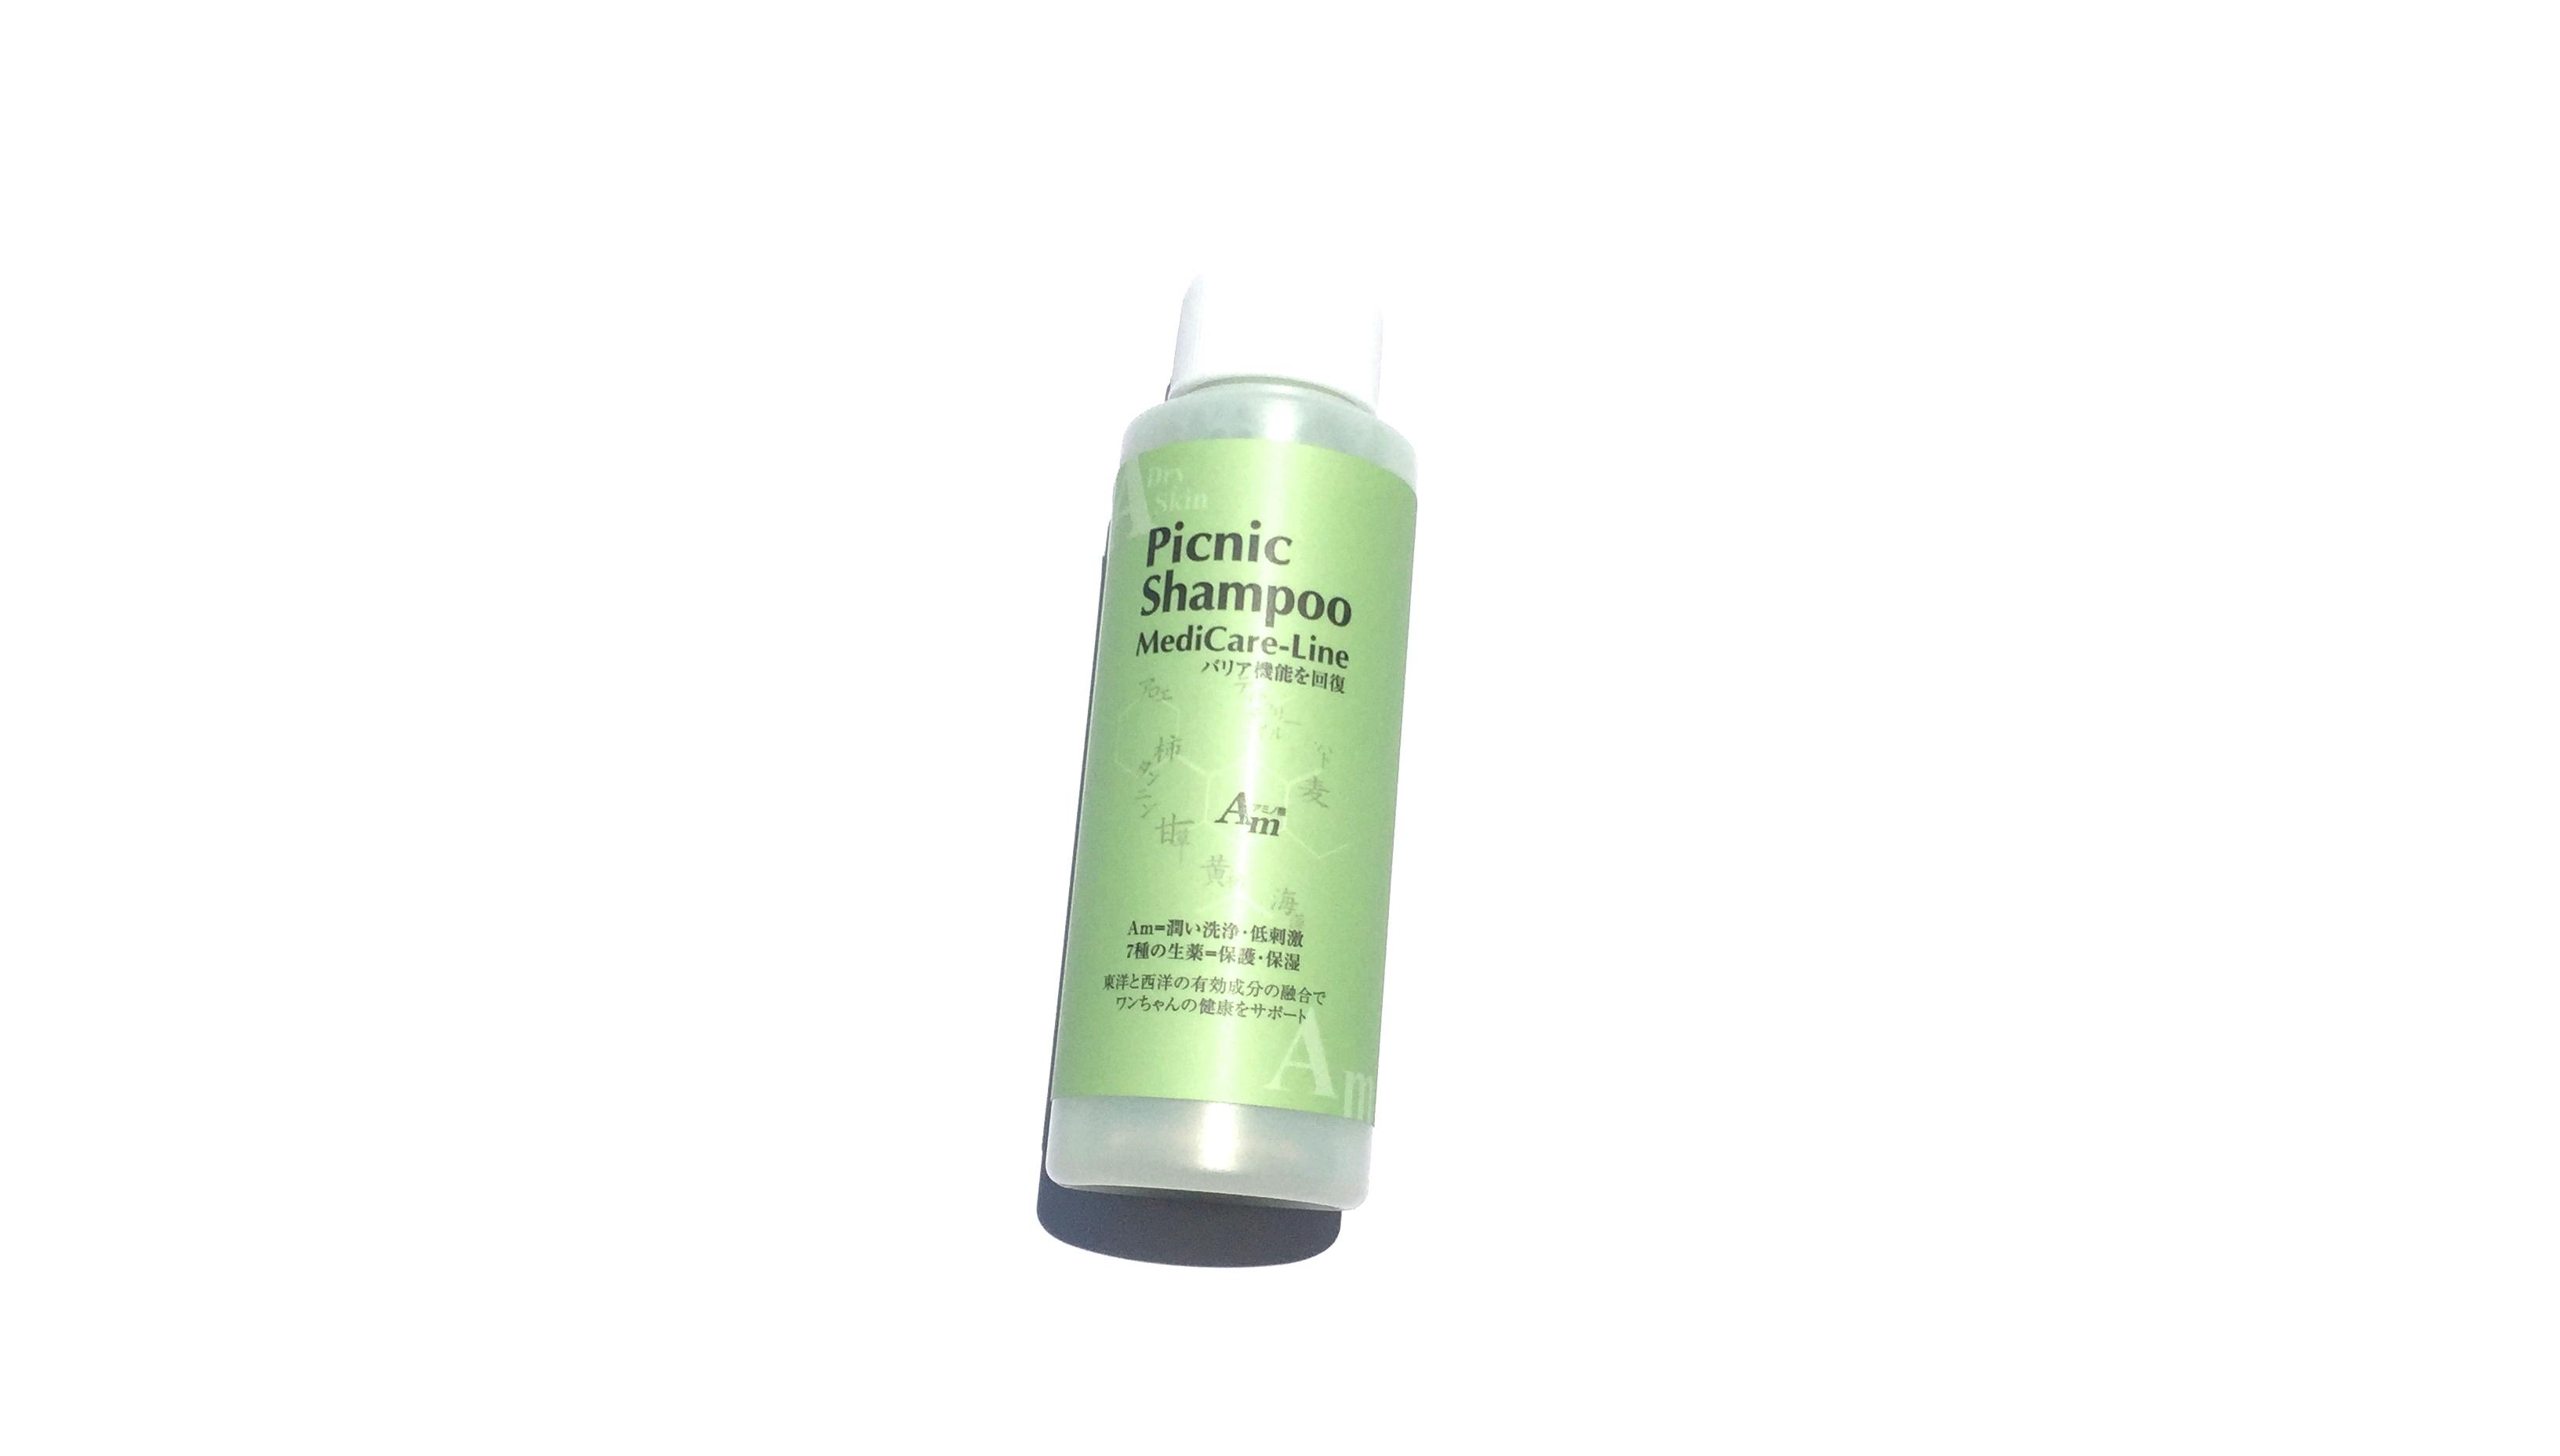 Picnic Shampoo  A ピクニック シャンプー エー ドライスキン_d0217958_11445381.jpg